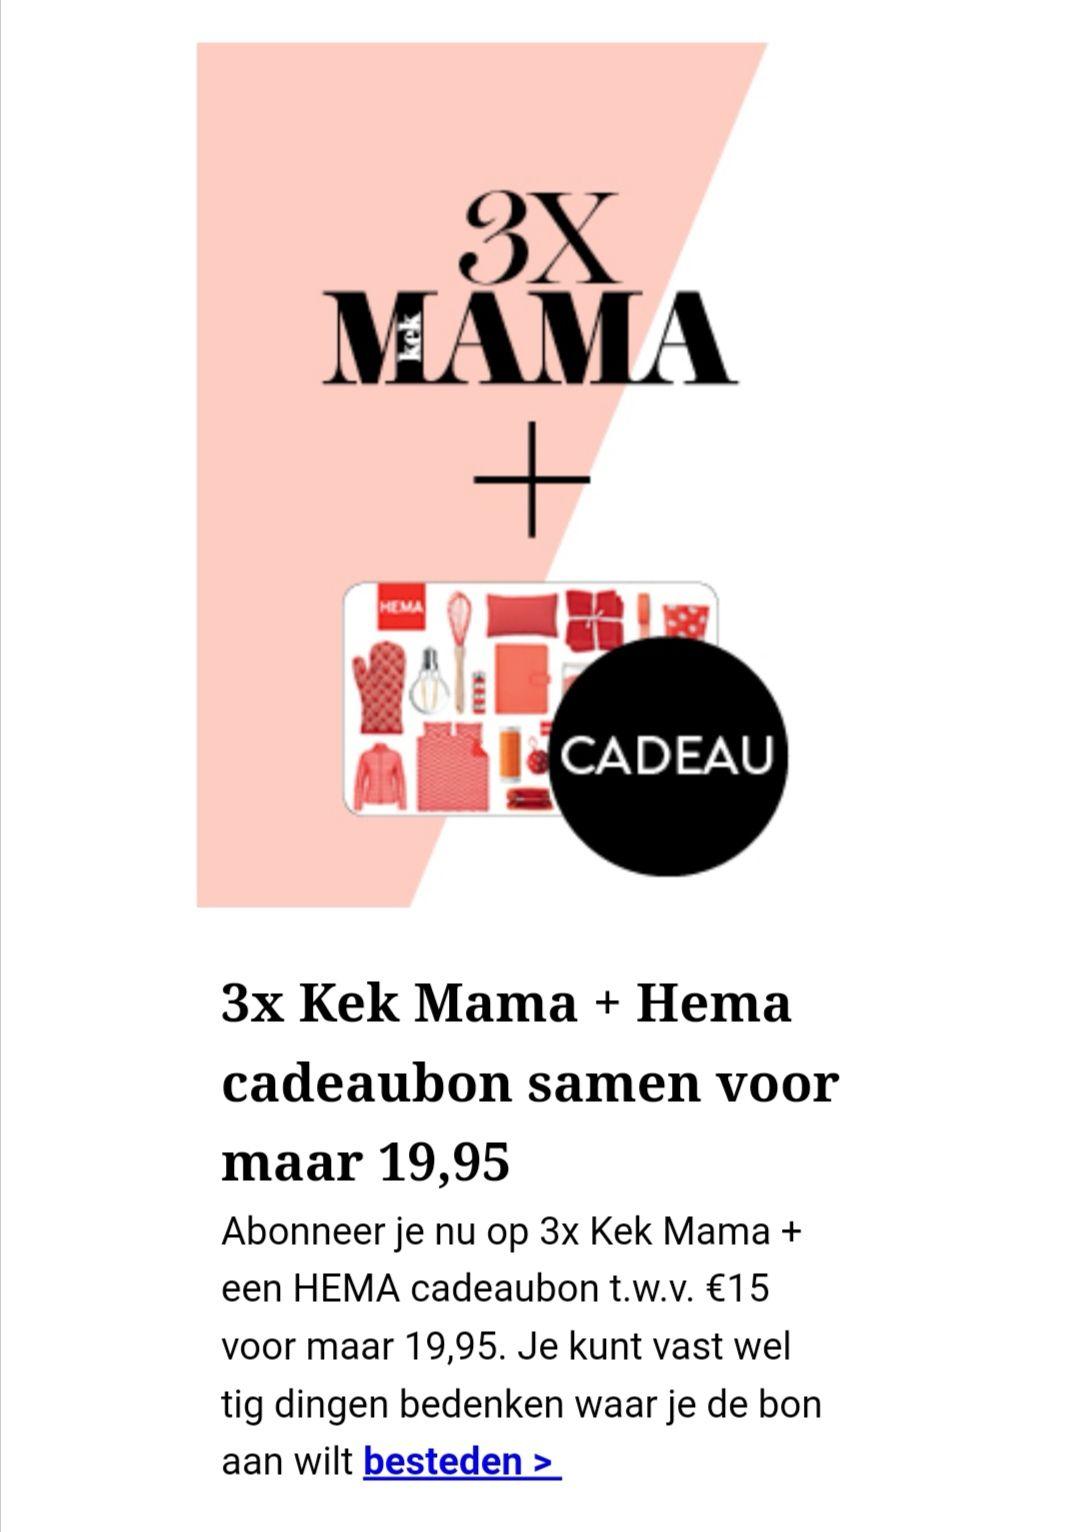 3 x Kek Mama incl. cadeaubon Hema á € 15,00